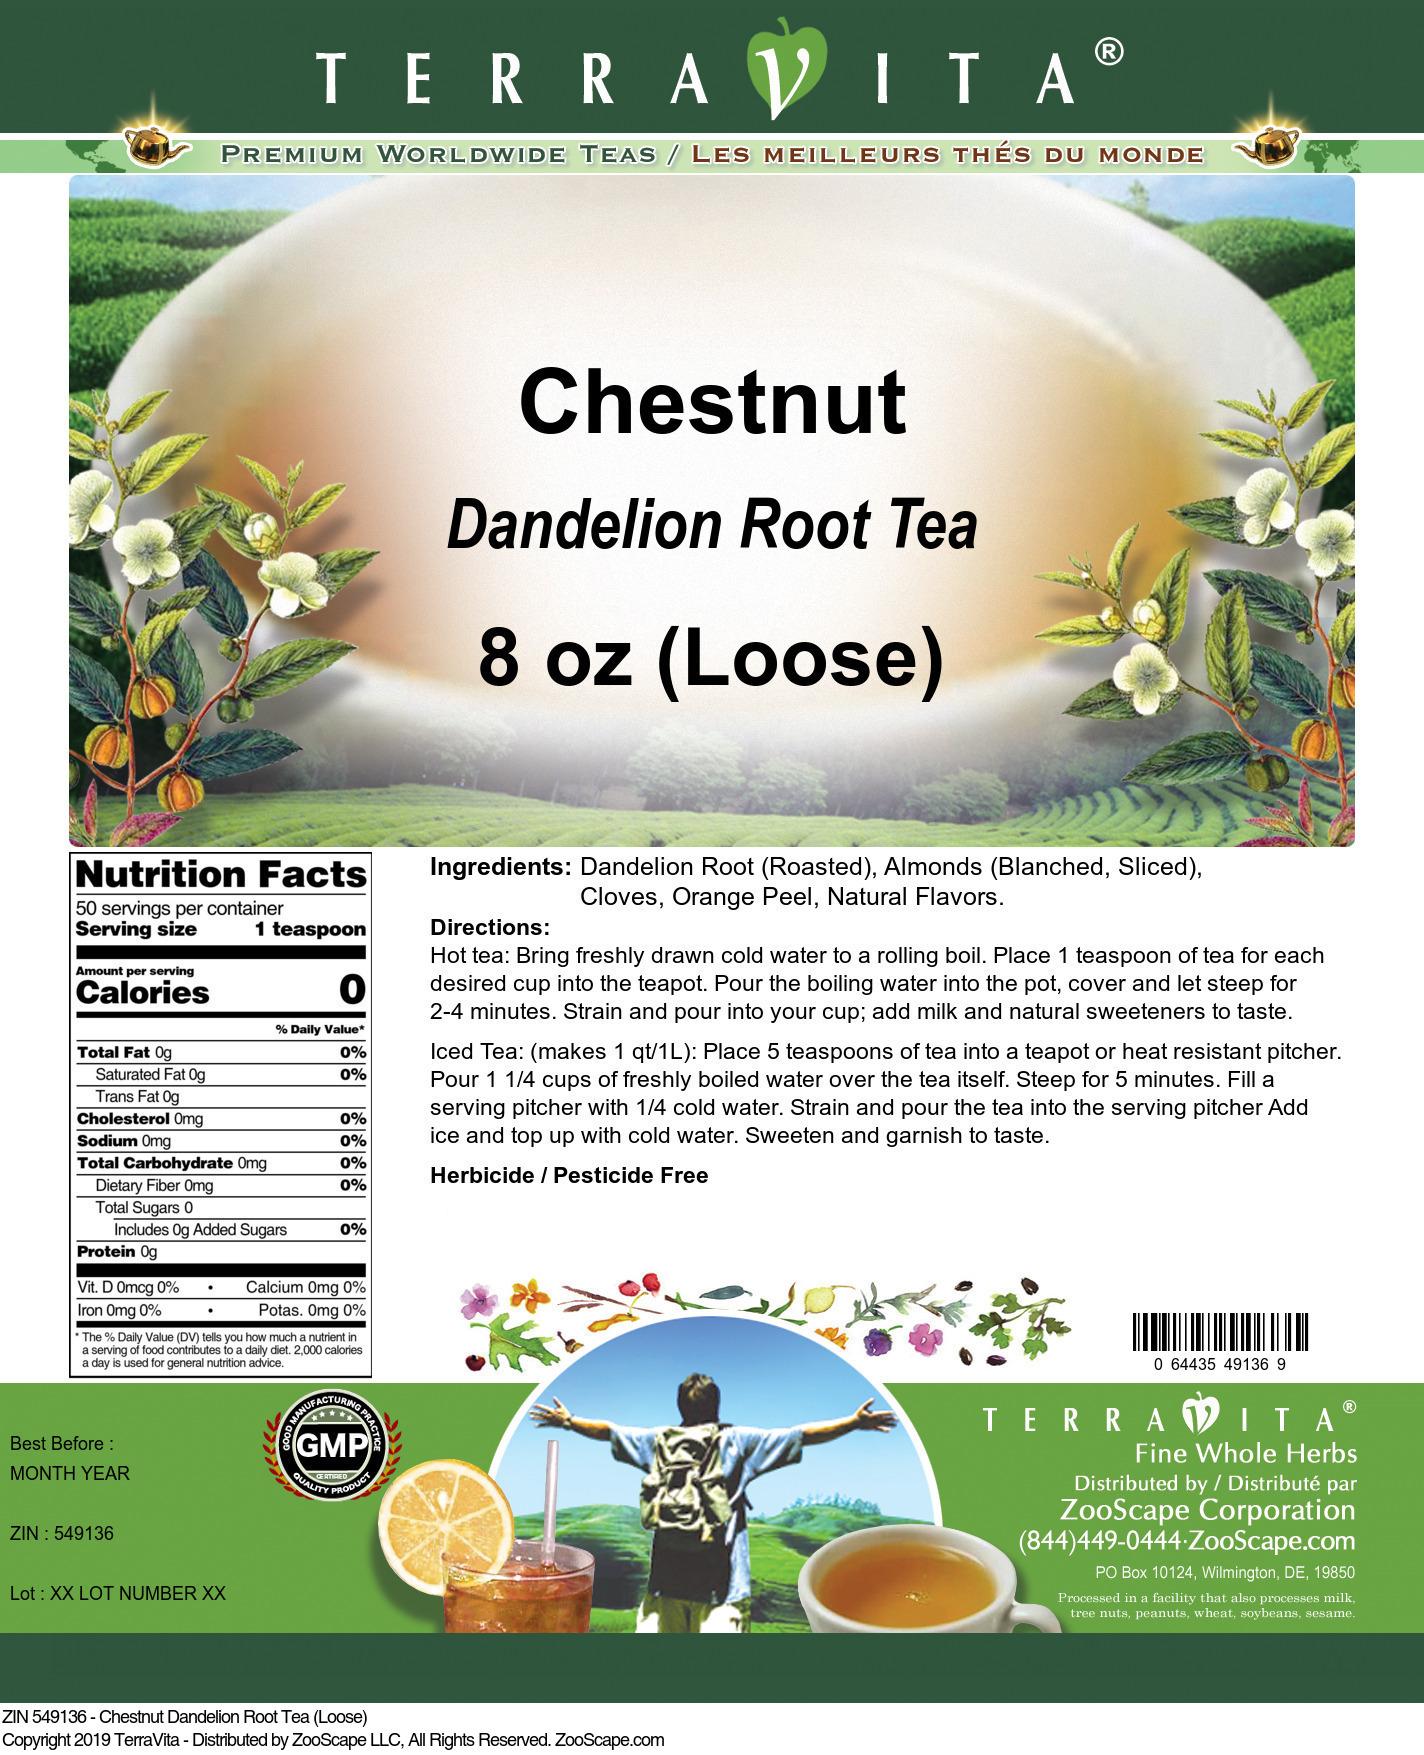 Chestnut Dandelion Root Tea (Loose)